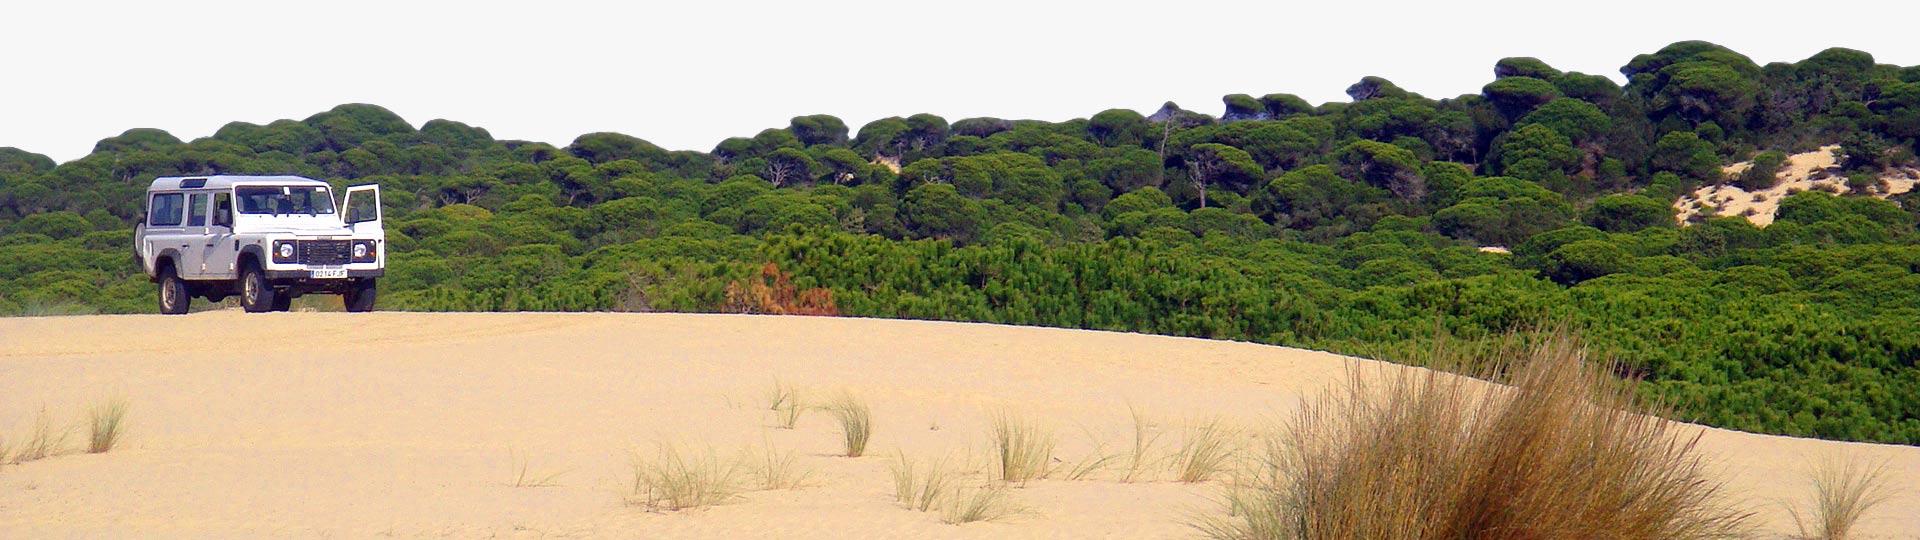 Doñana nationalpark (Huelva, Andalusien)